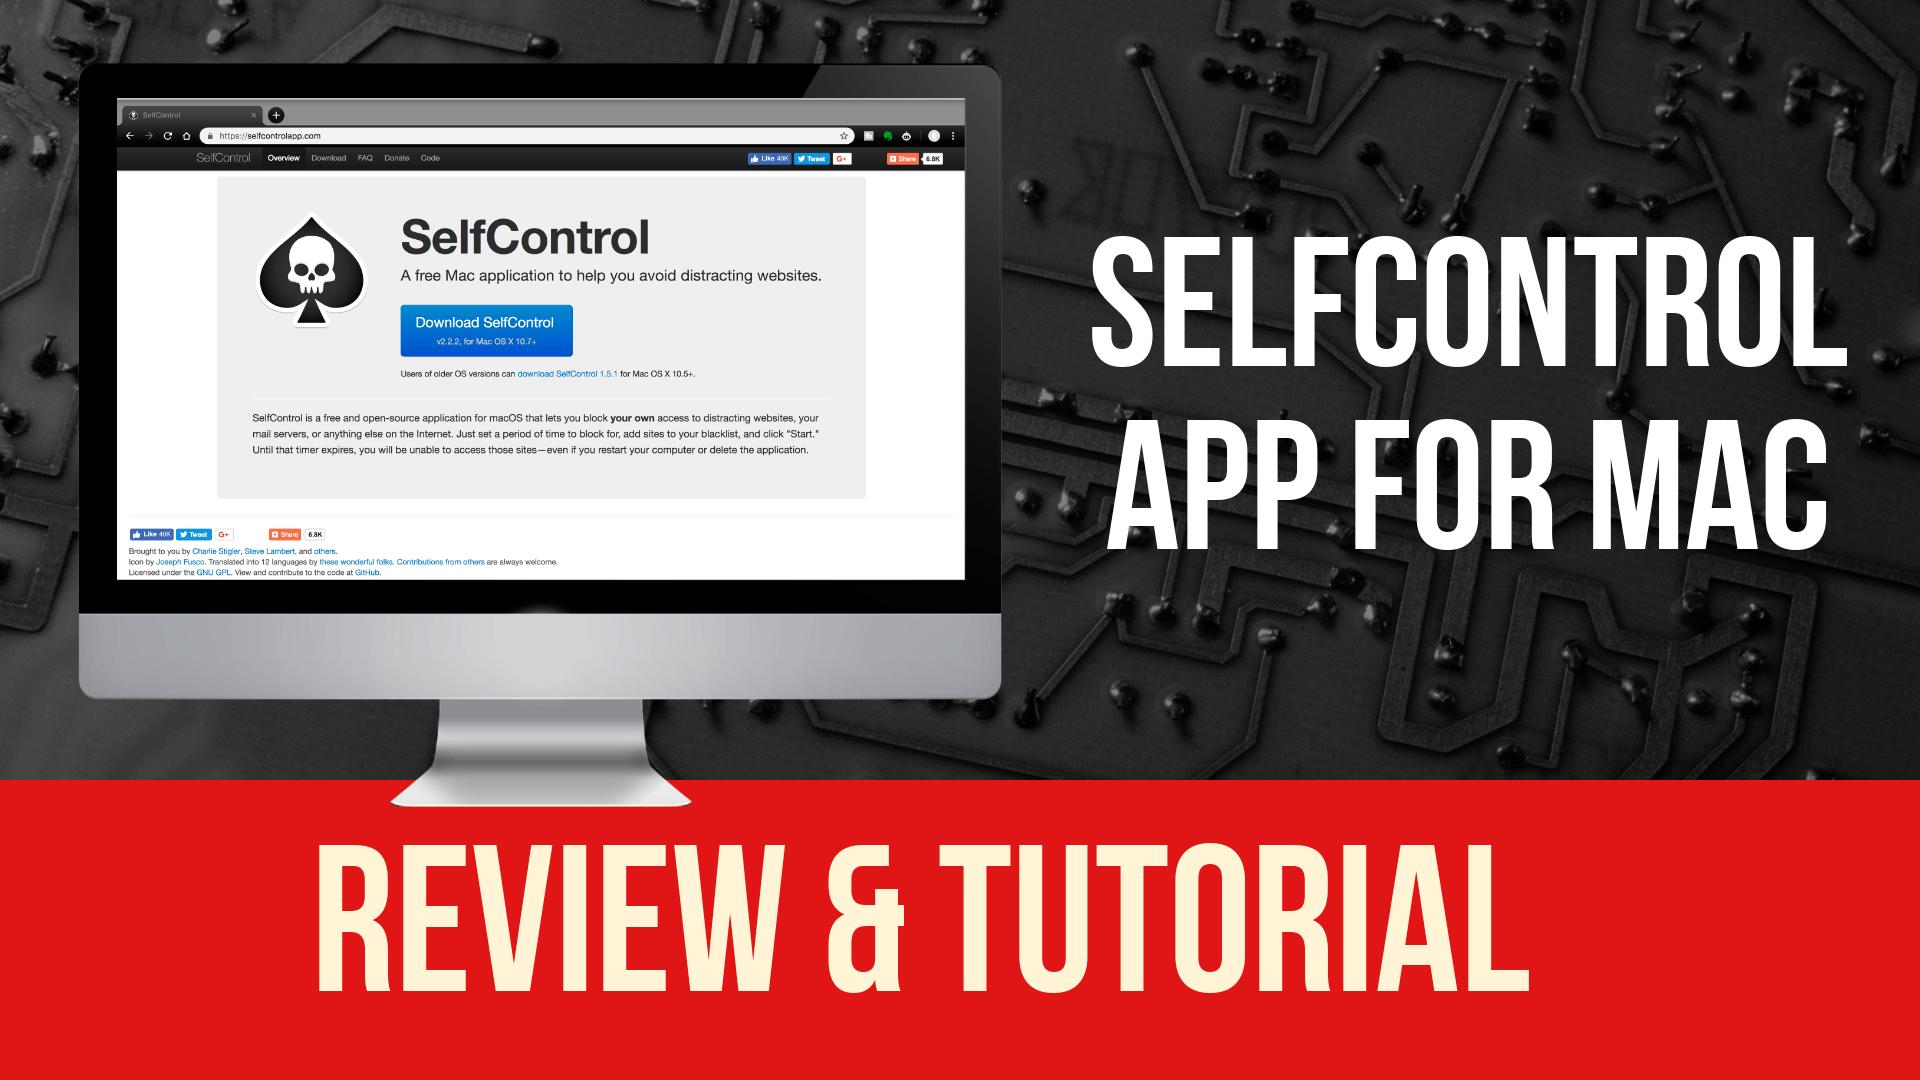 Selfcontrol App Tutorial